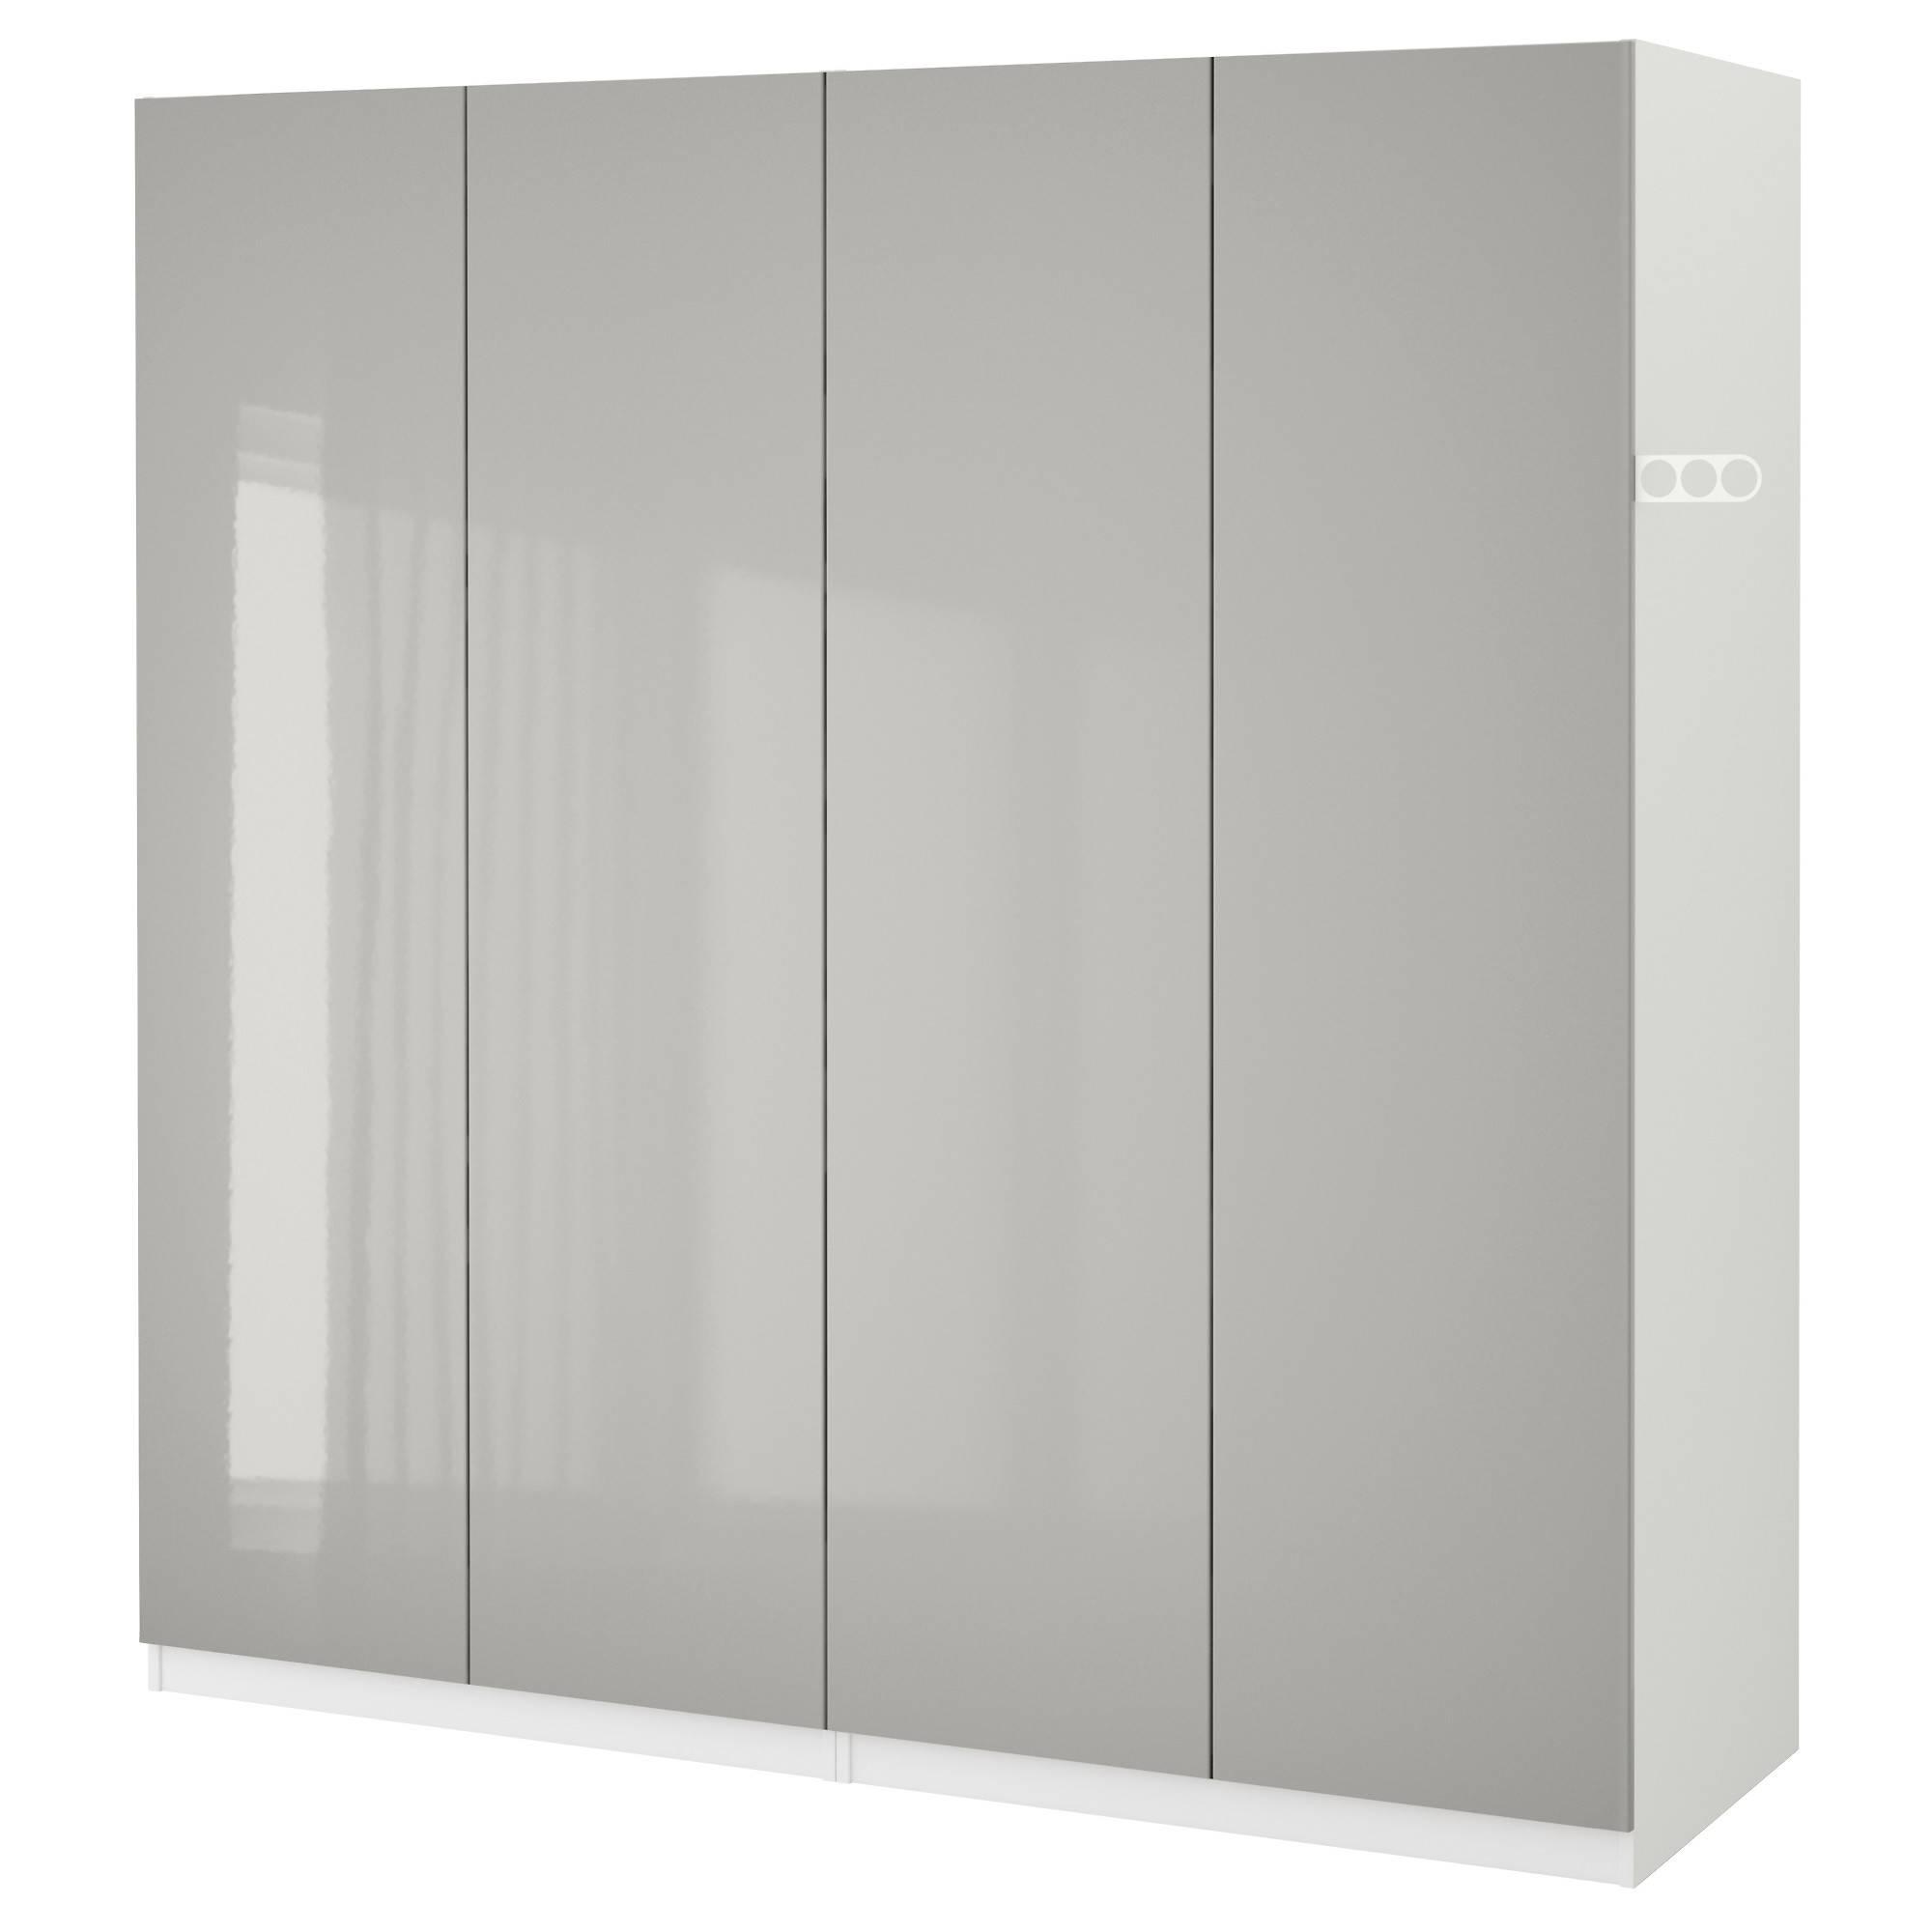 Pax Wardrobe White/fardal High-Gloss Light Grey 200X60X201 Cm - Ikea with regard to High Gloss White Wardrobes (Image 5 of 15)